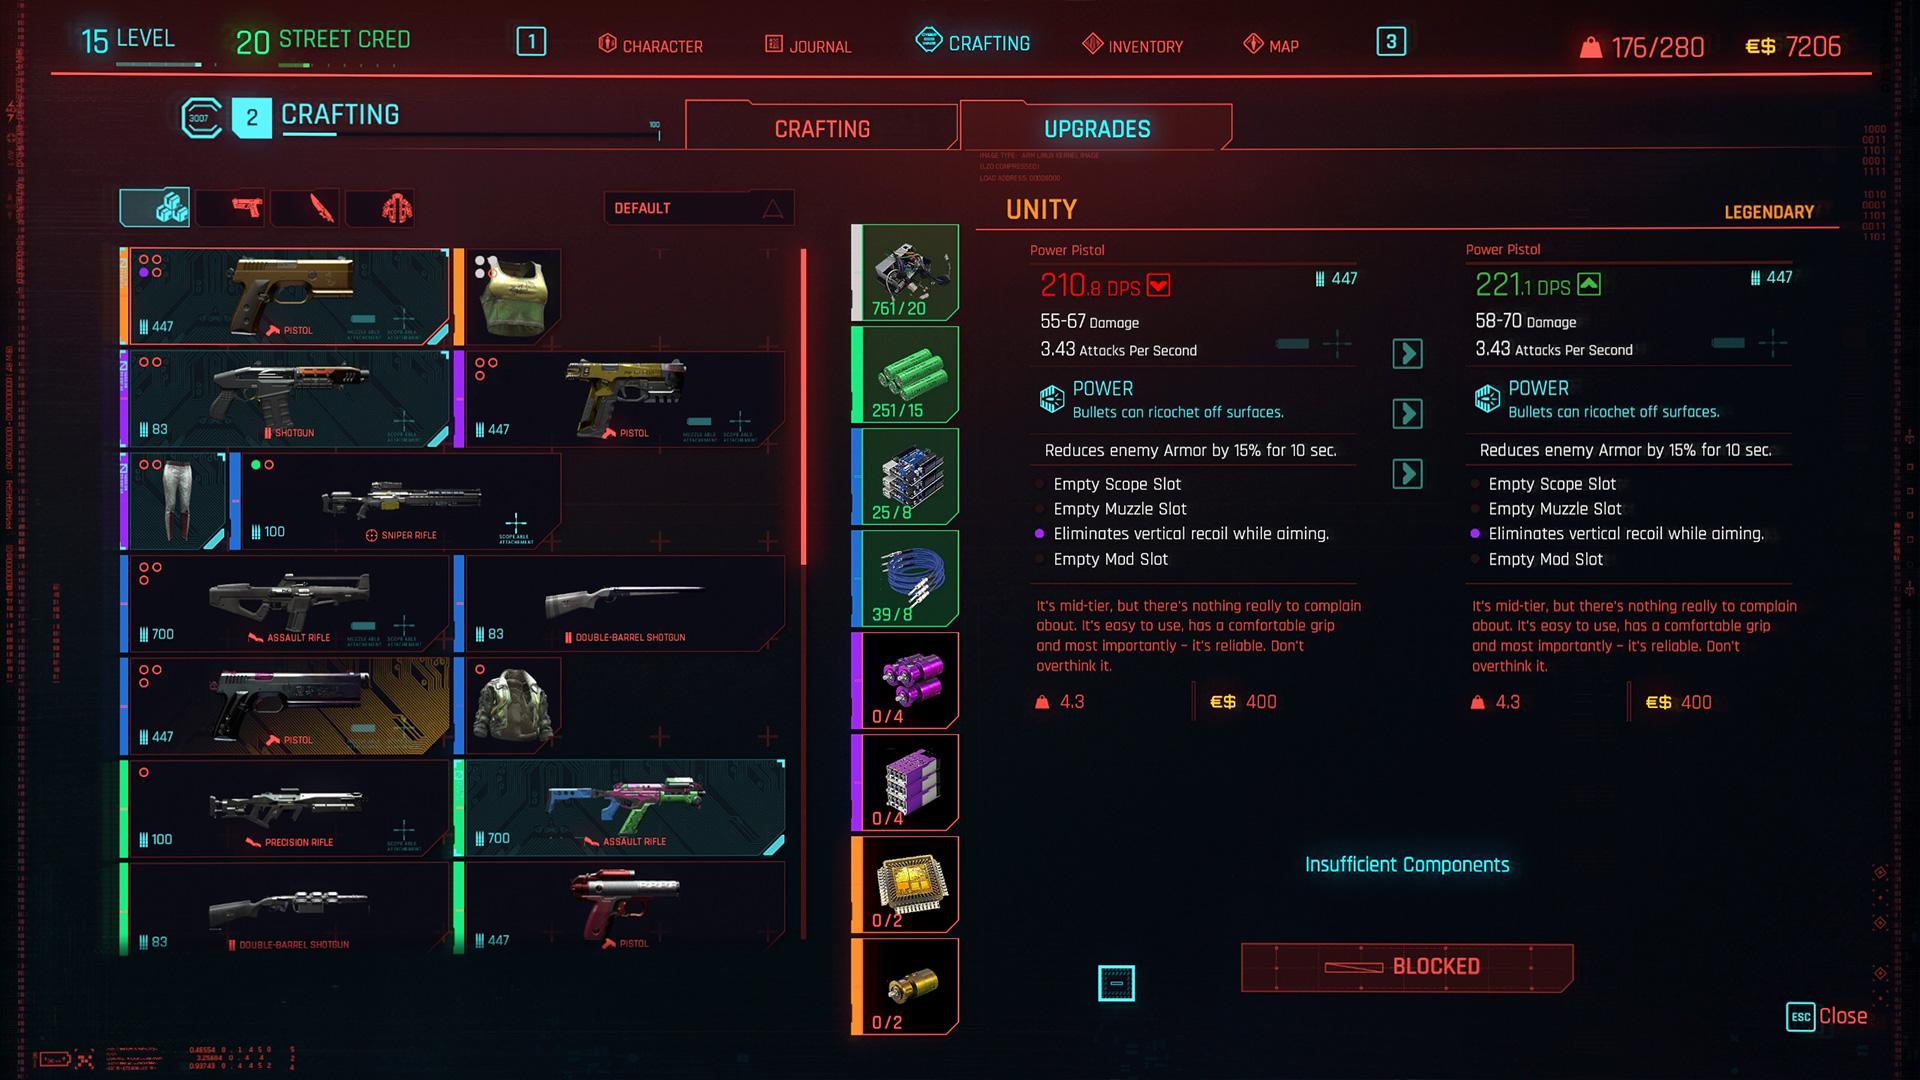 Cyberpunk 2077 - Crafting